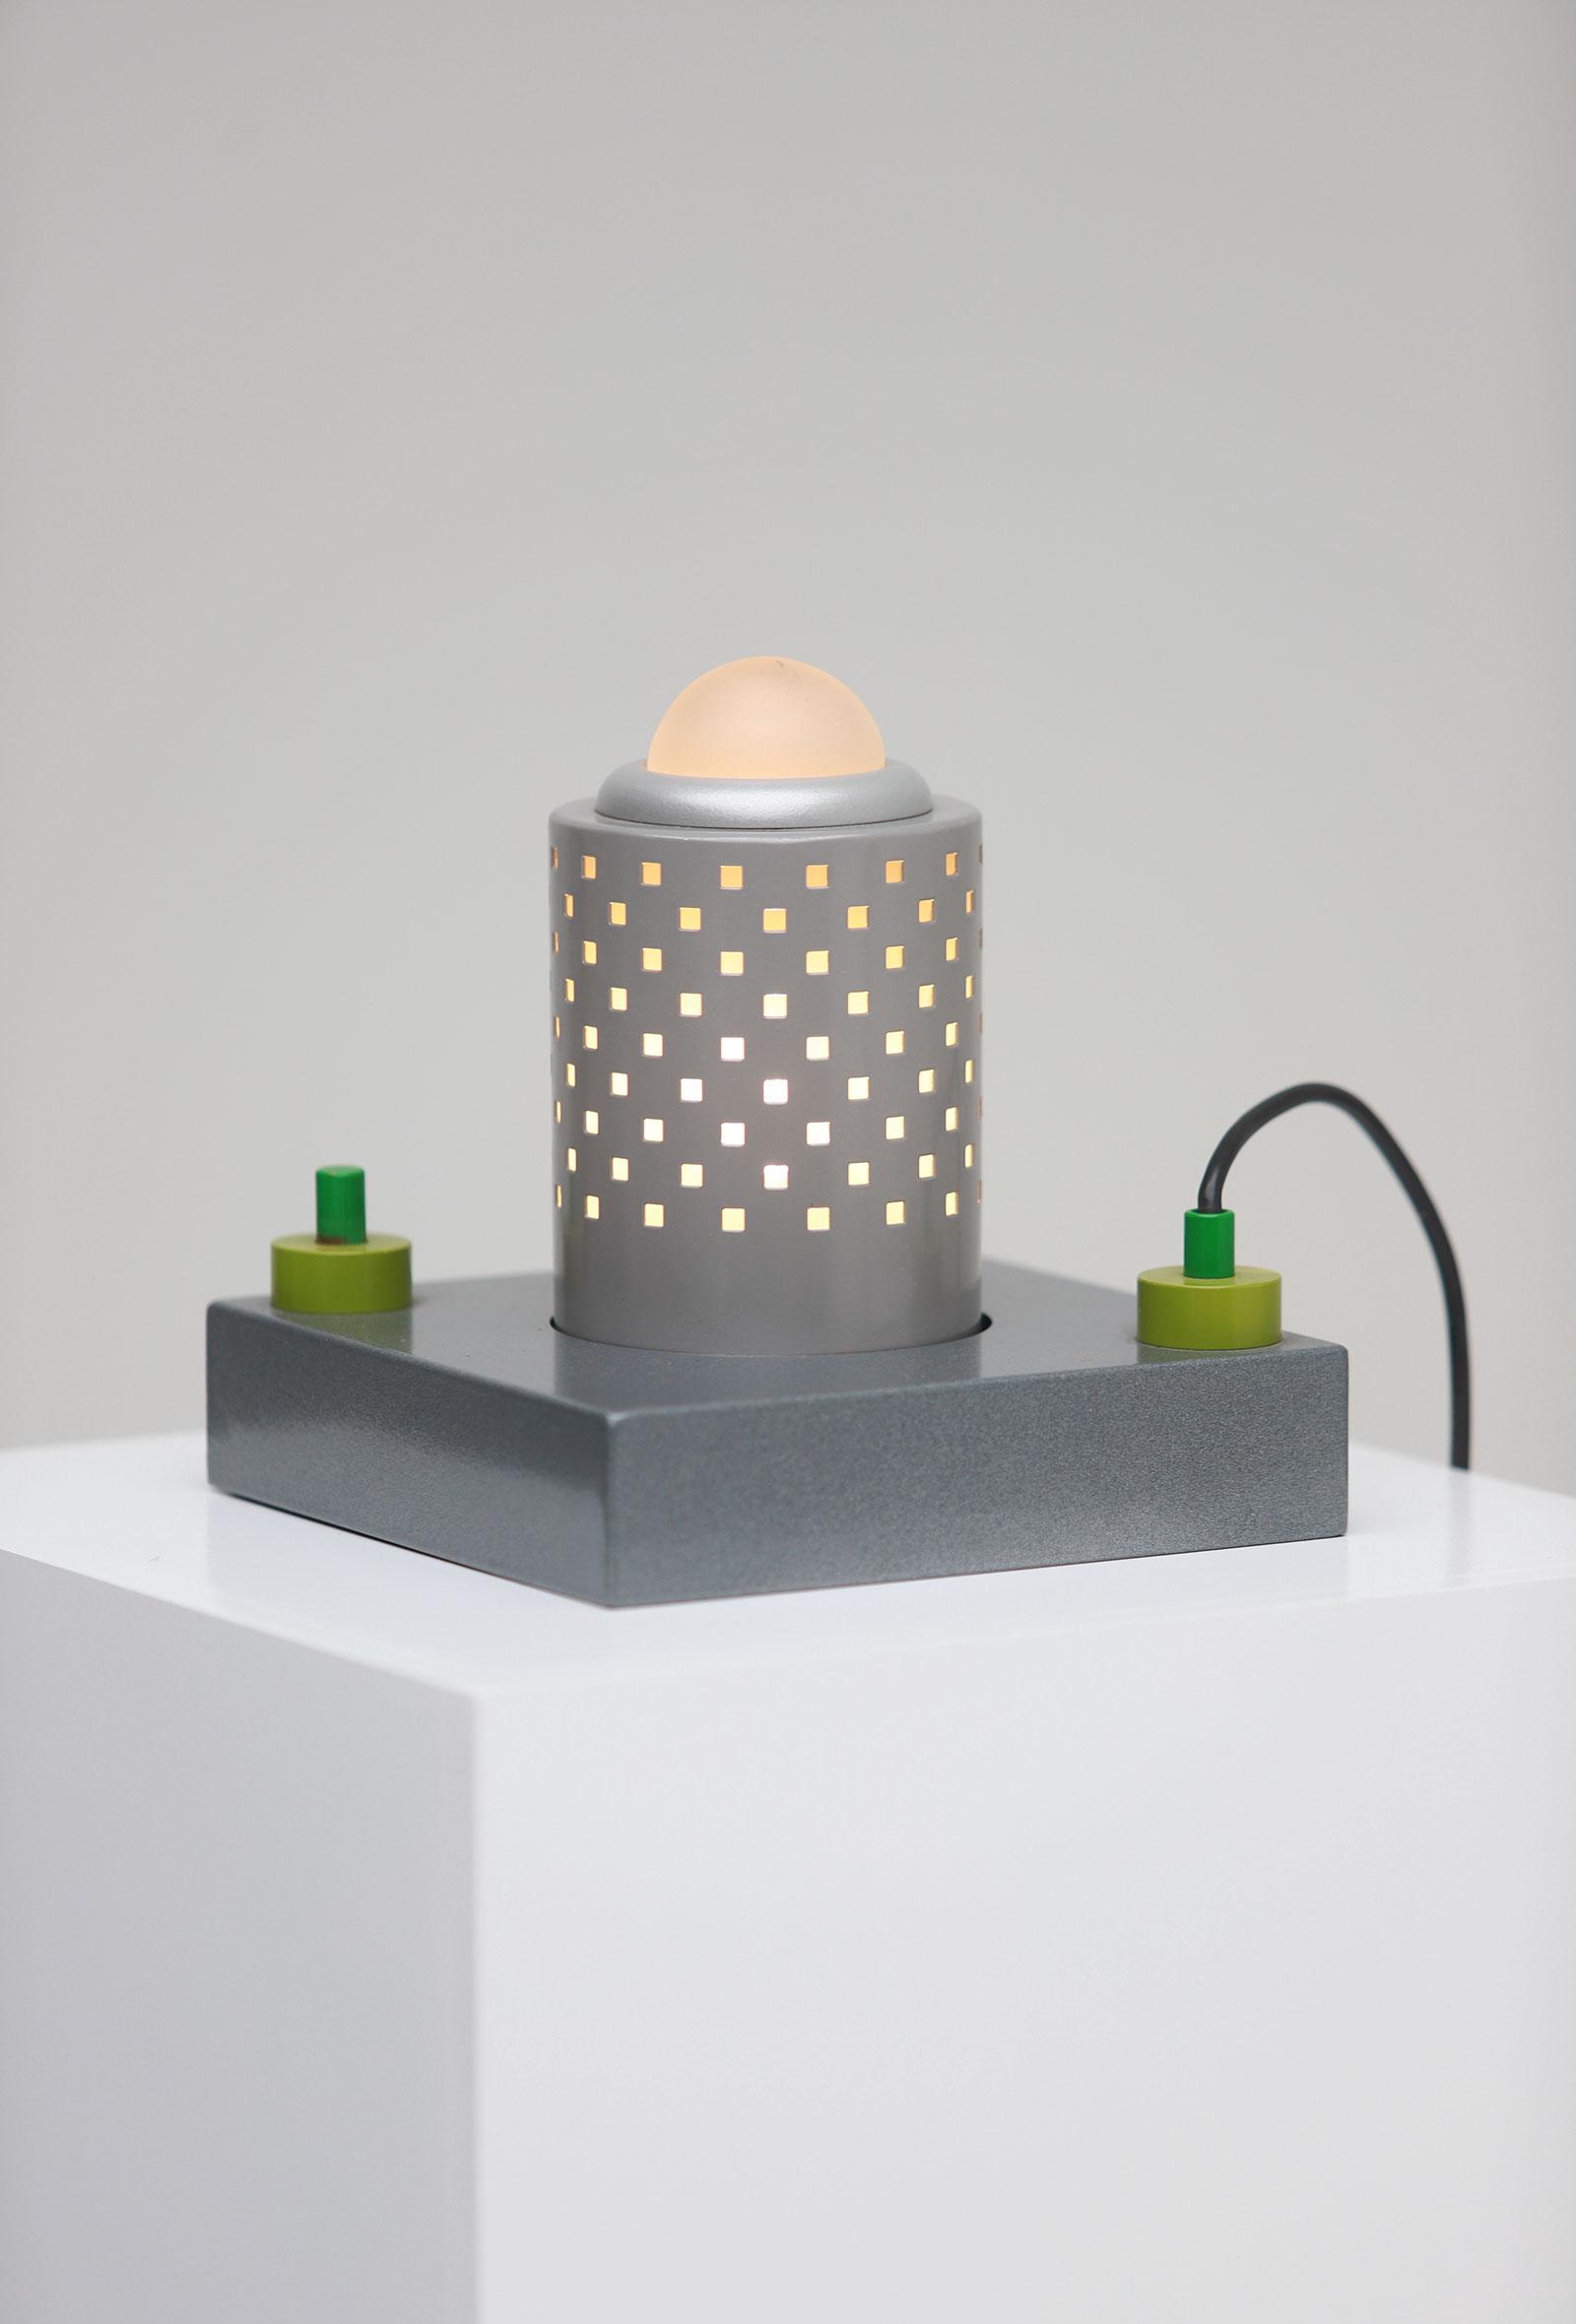 Matteo Thun Dieci Spargi table lampimage 2